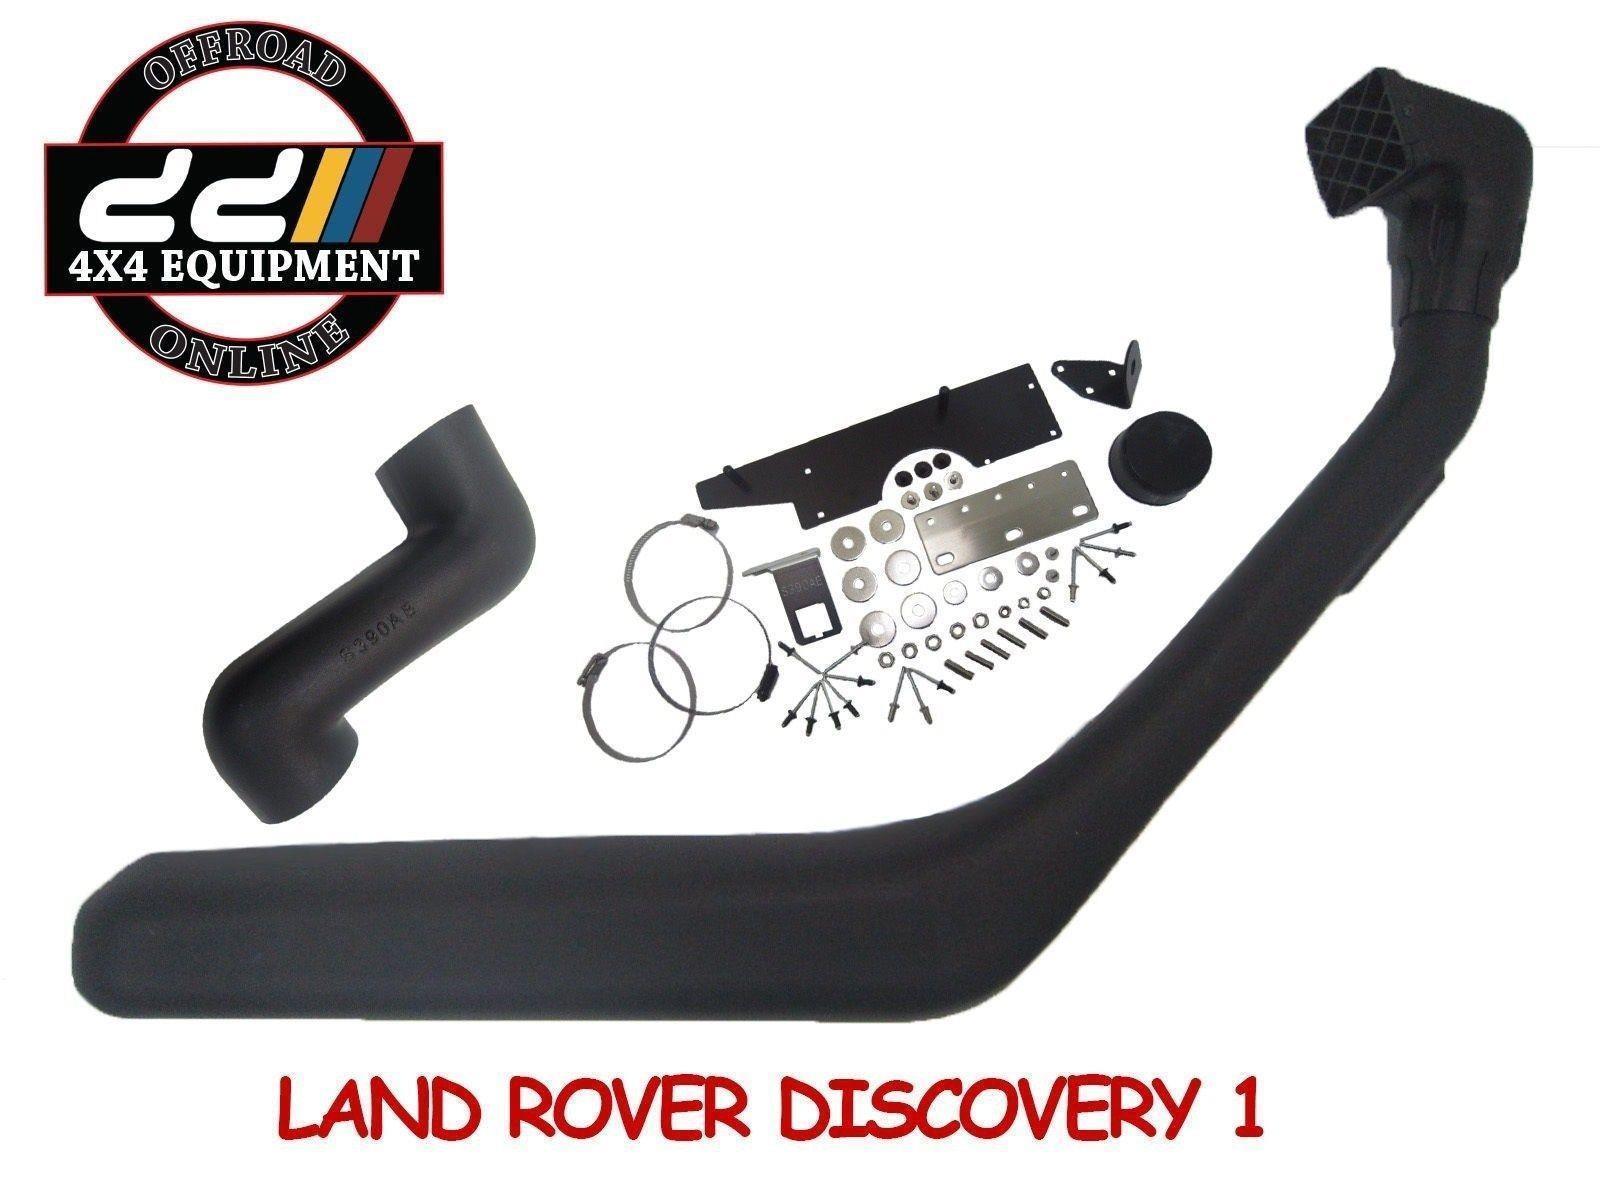 USエア インテーク シュノーケル スノーケルキットエアインテークLand Rover Discovery 1 94-98 300 Petrol& ディーゼルV8 TDi Snorkel Kit Air Intake Land Rover Discovery 1 94-98 300 Petrol & Diesel V8 TDi